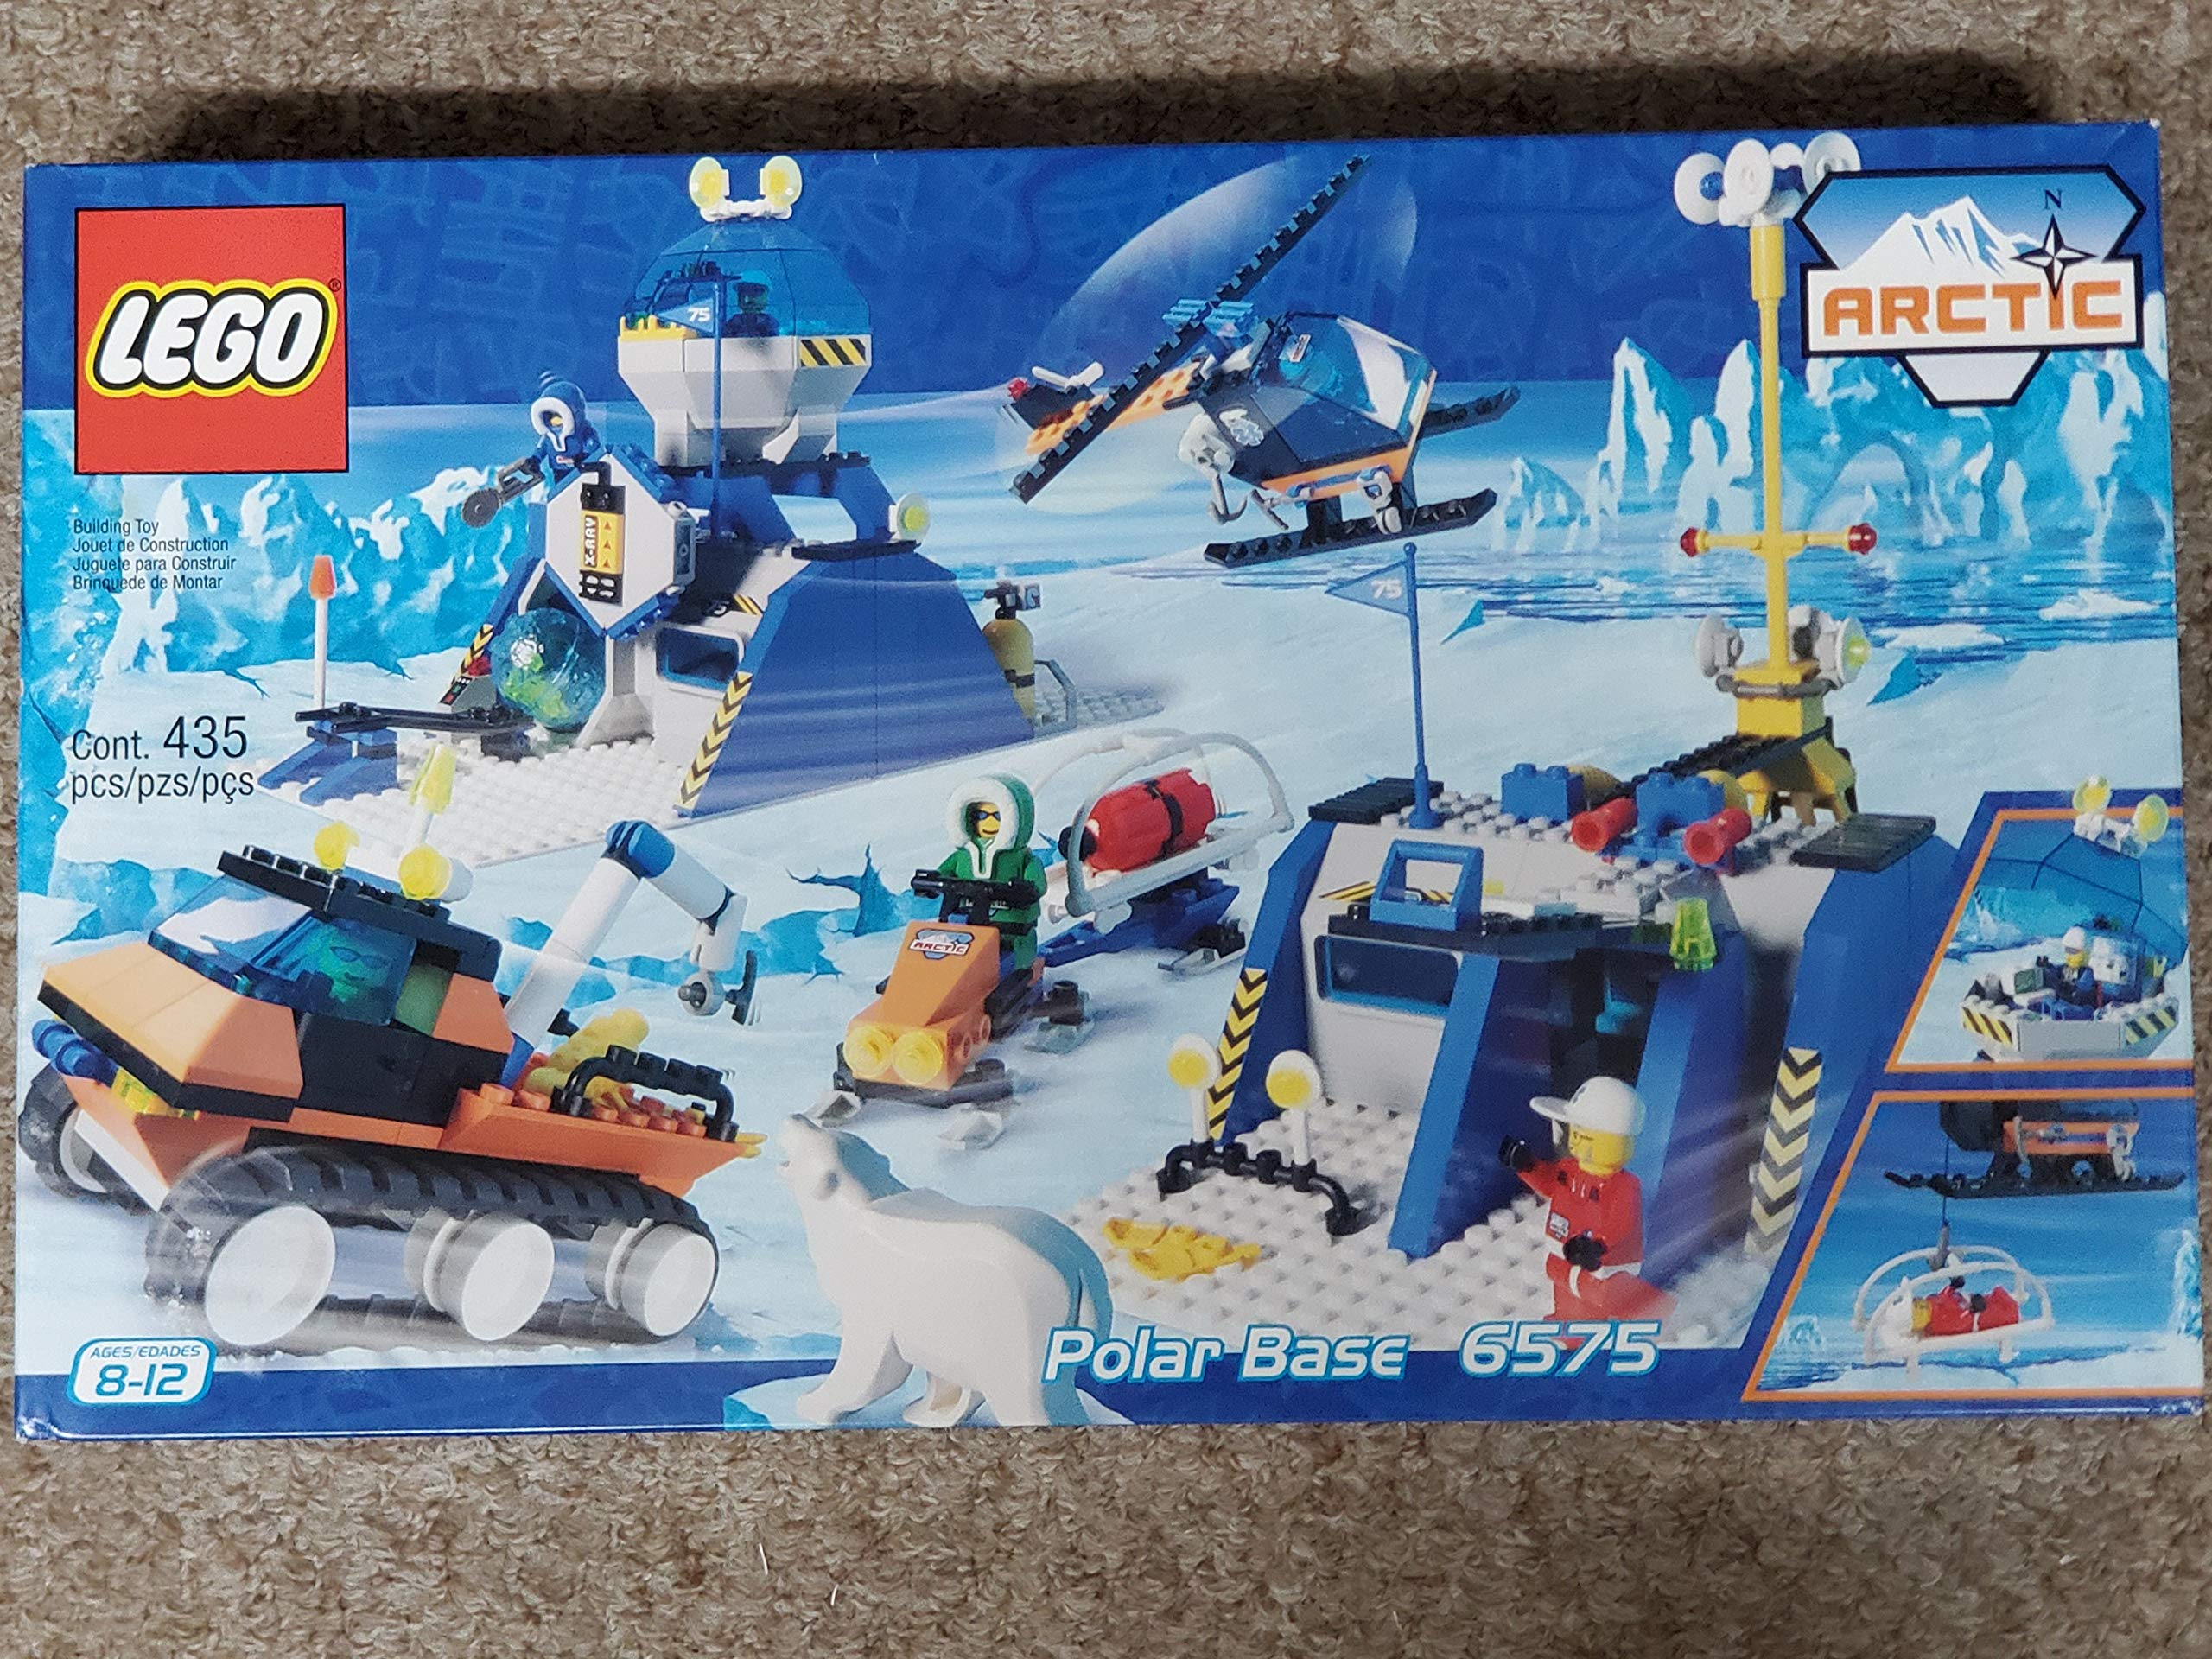 LEGO Arctic 6575 Polar Base